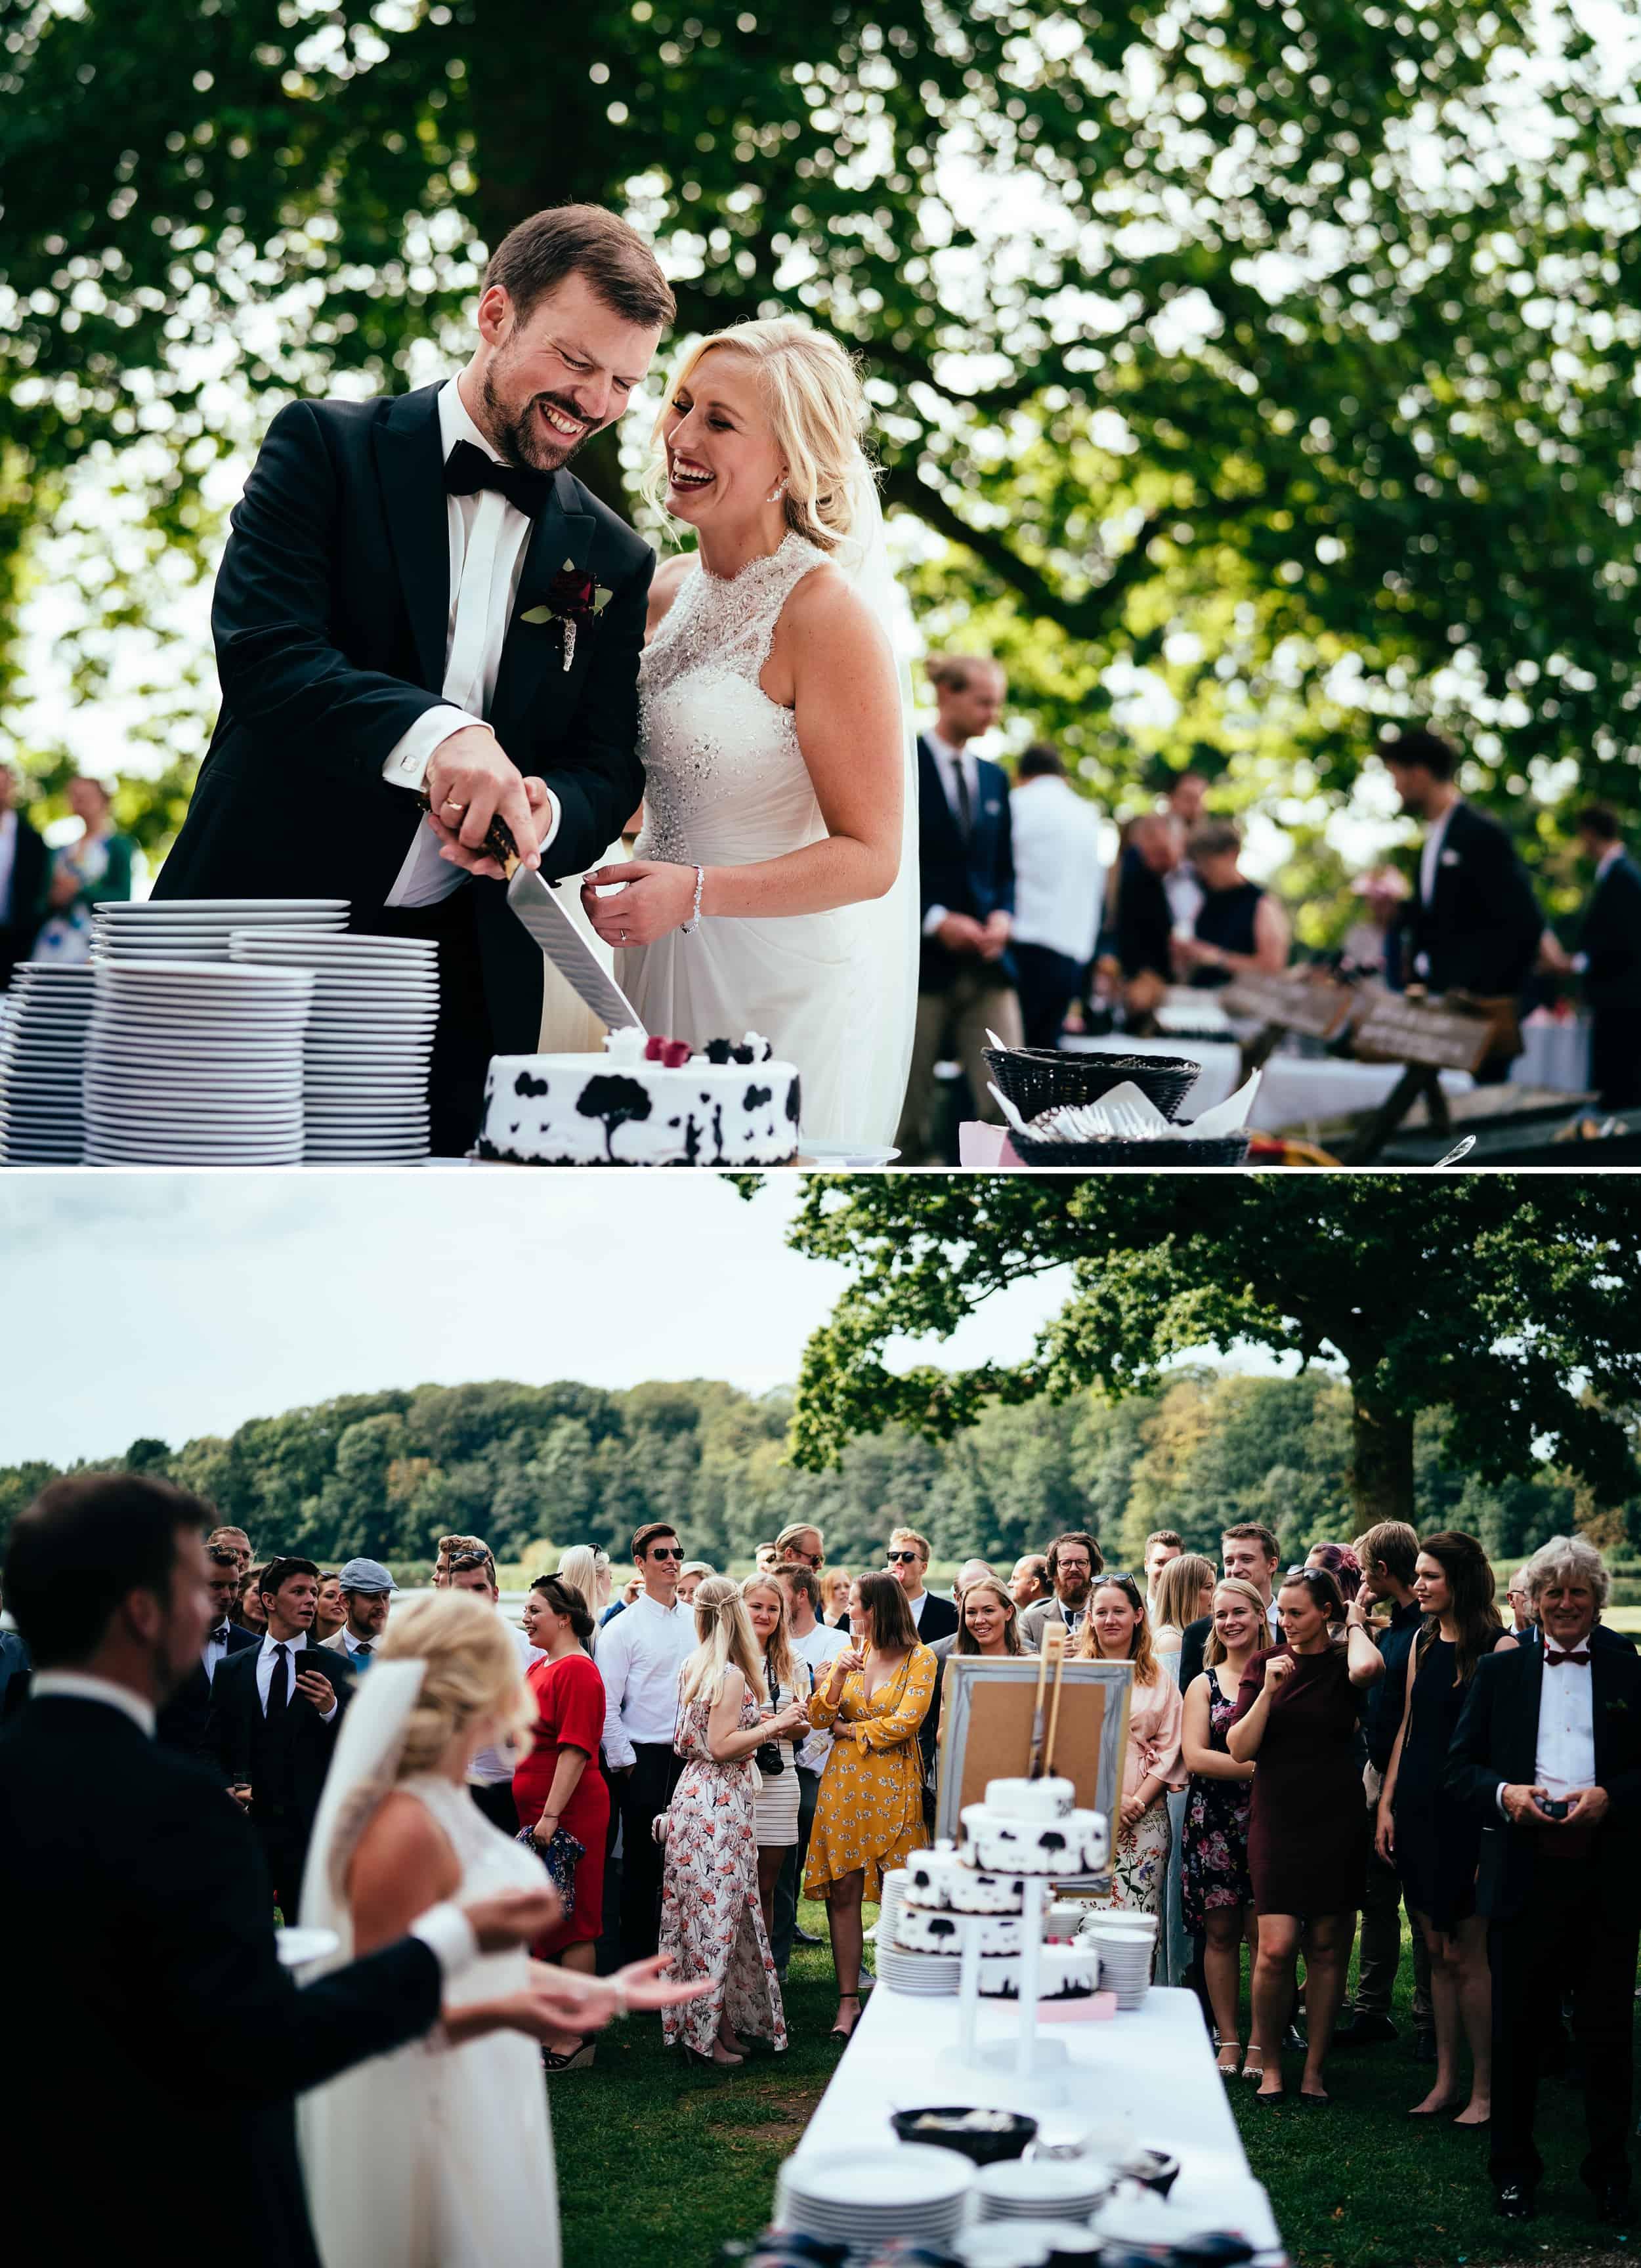 skæring-af-bryllupskage_1.jpg